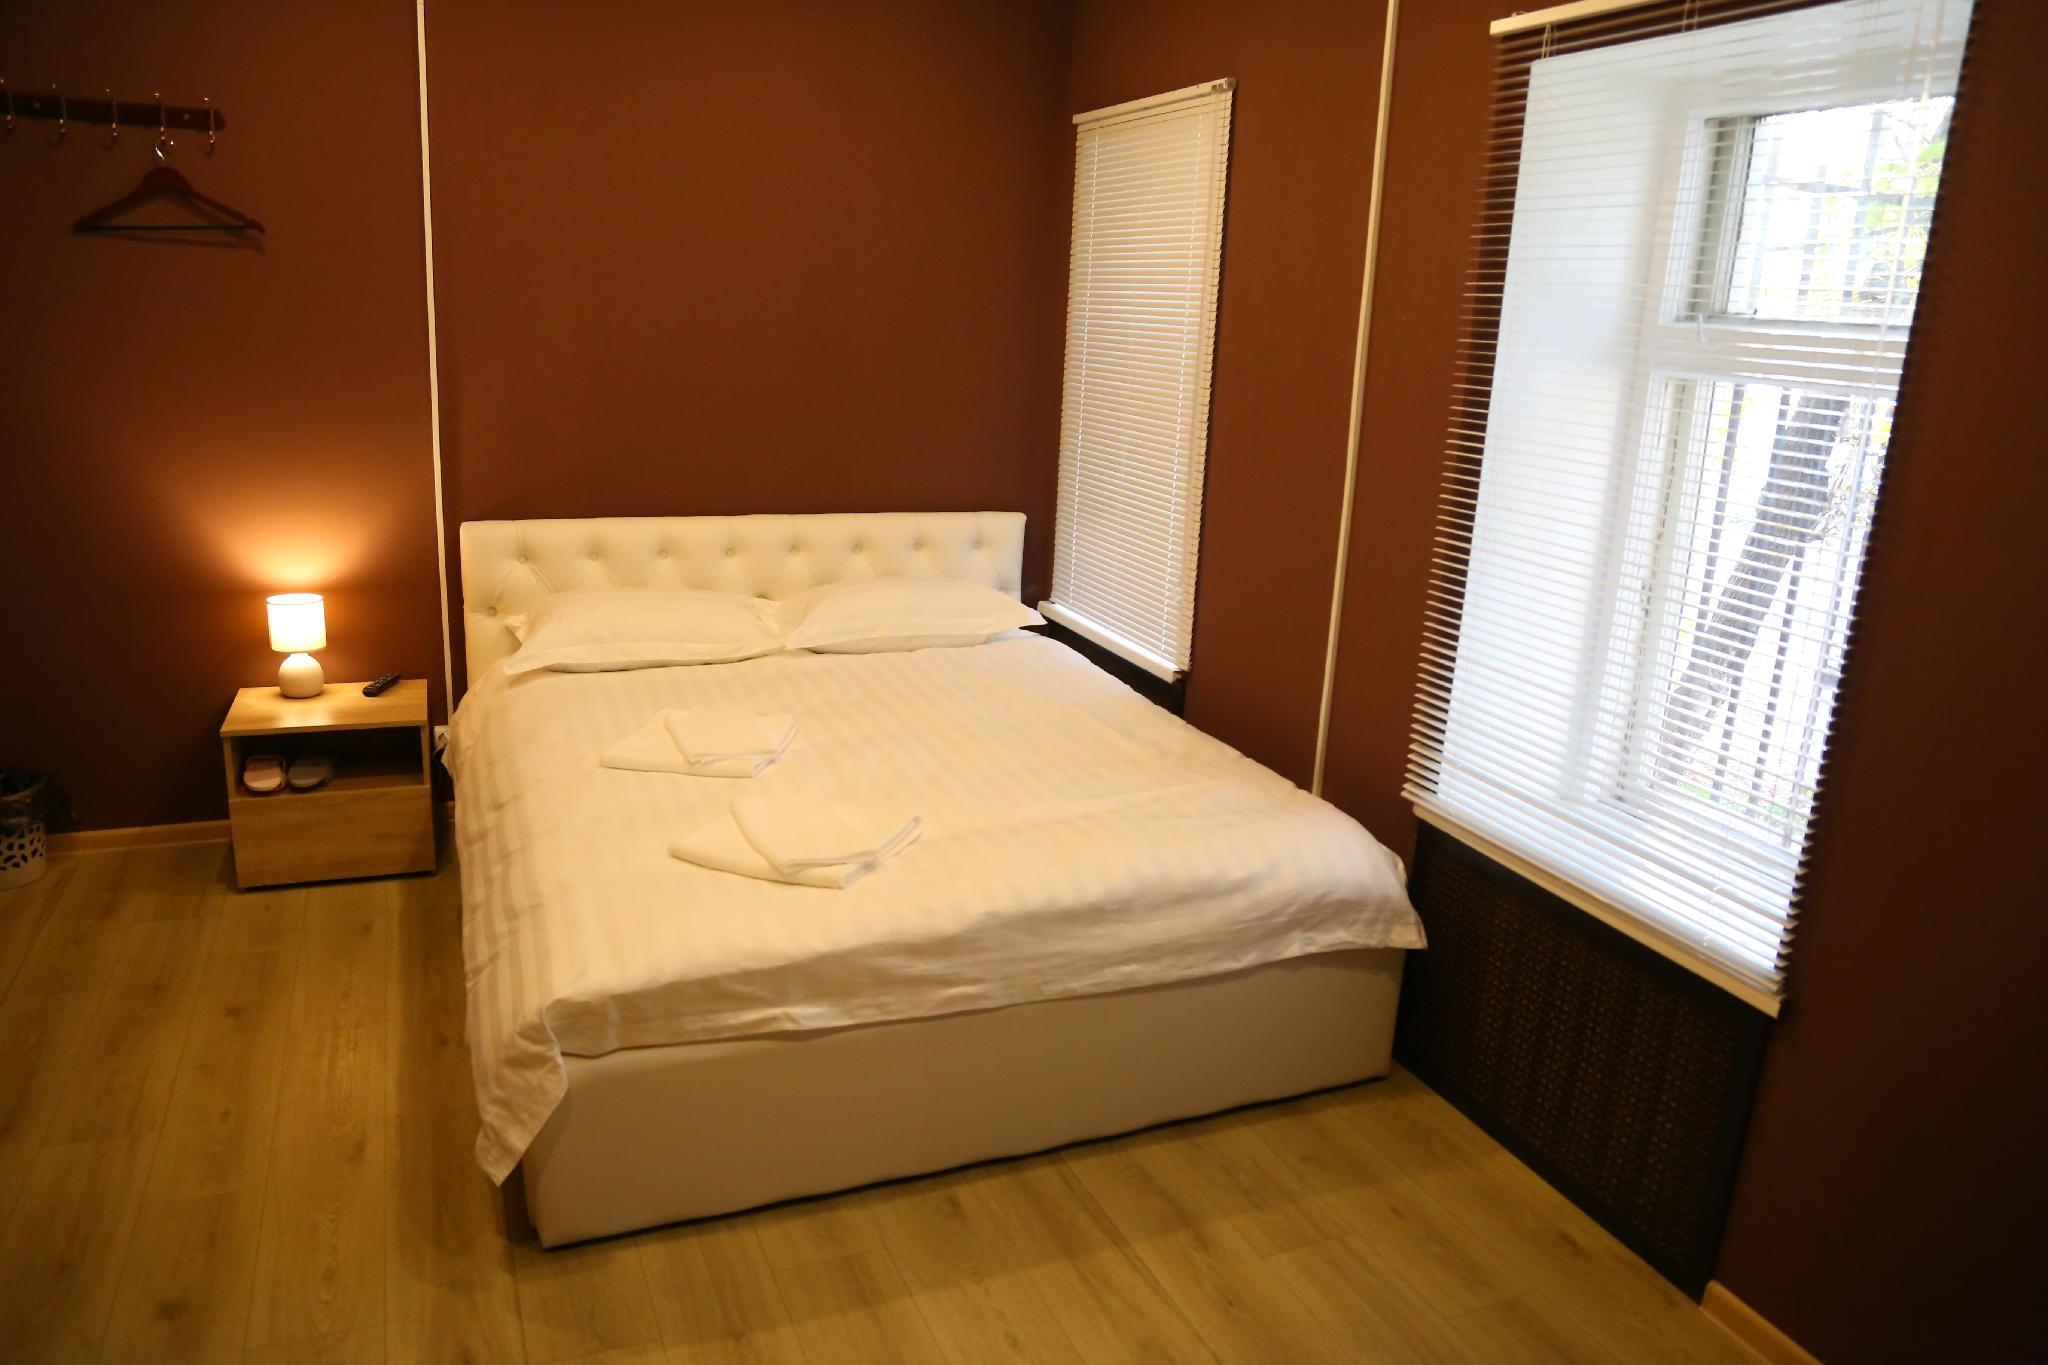 Hotelchik